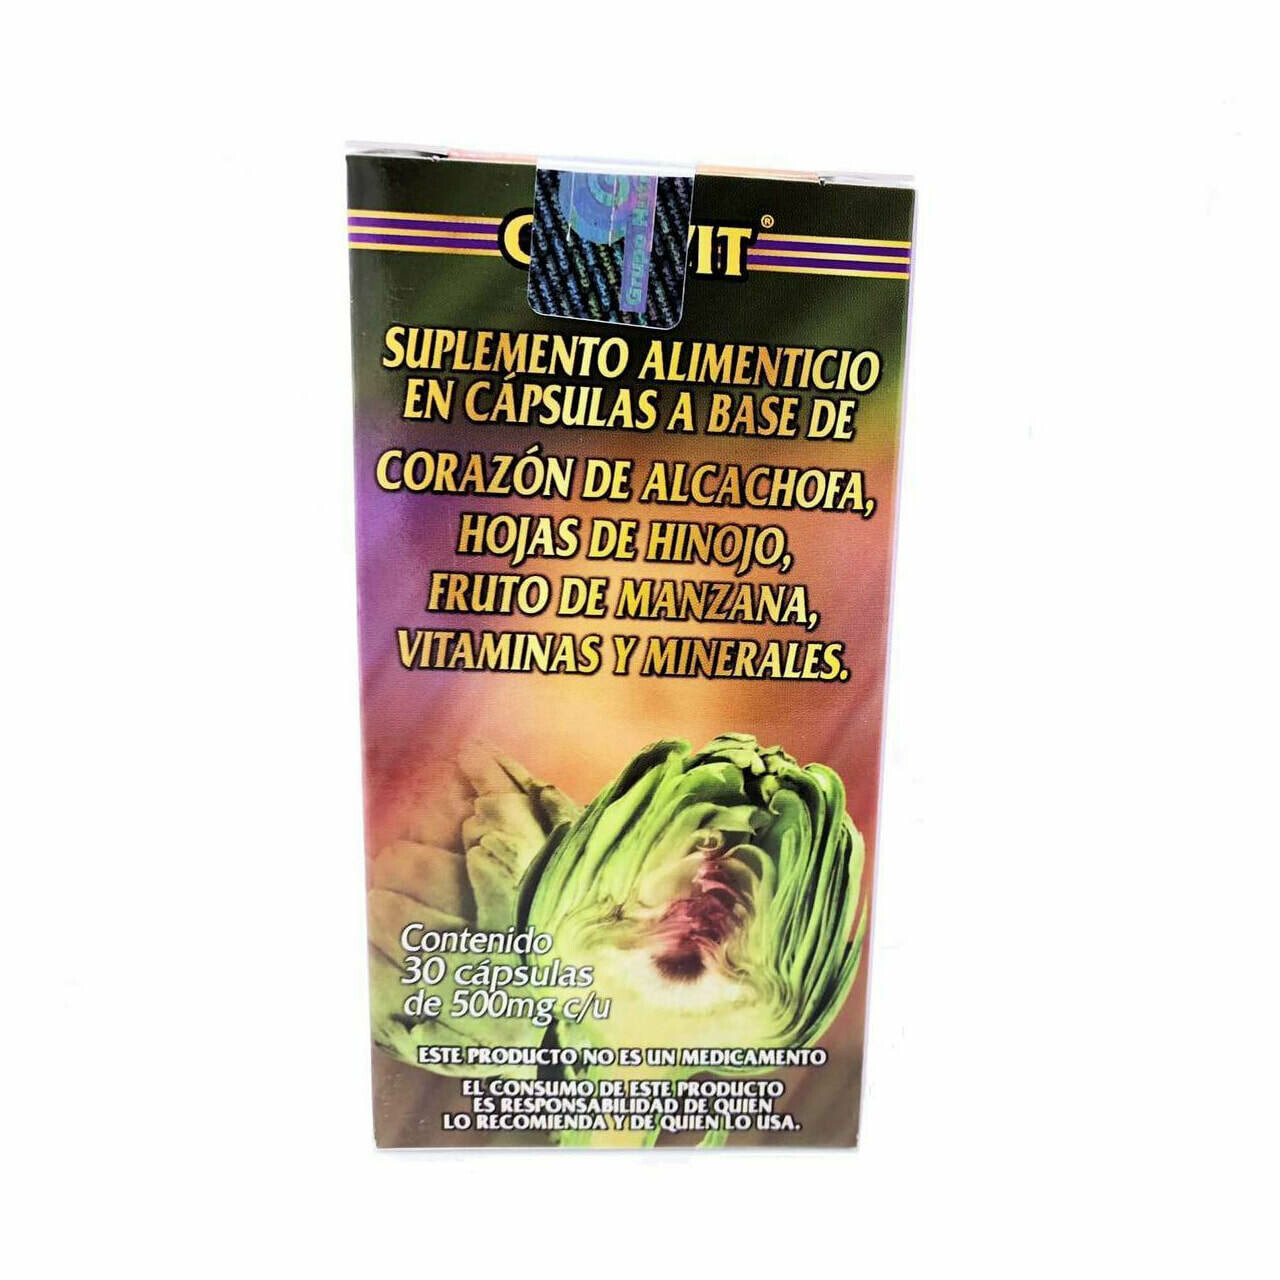 Capsulas de Alcachofa | Artichoke Capsules